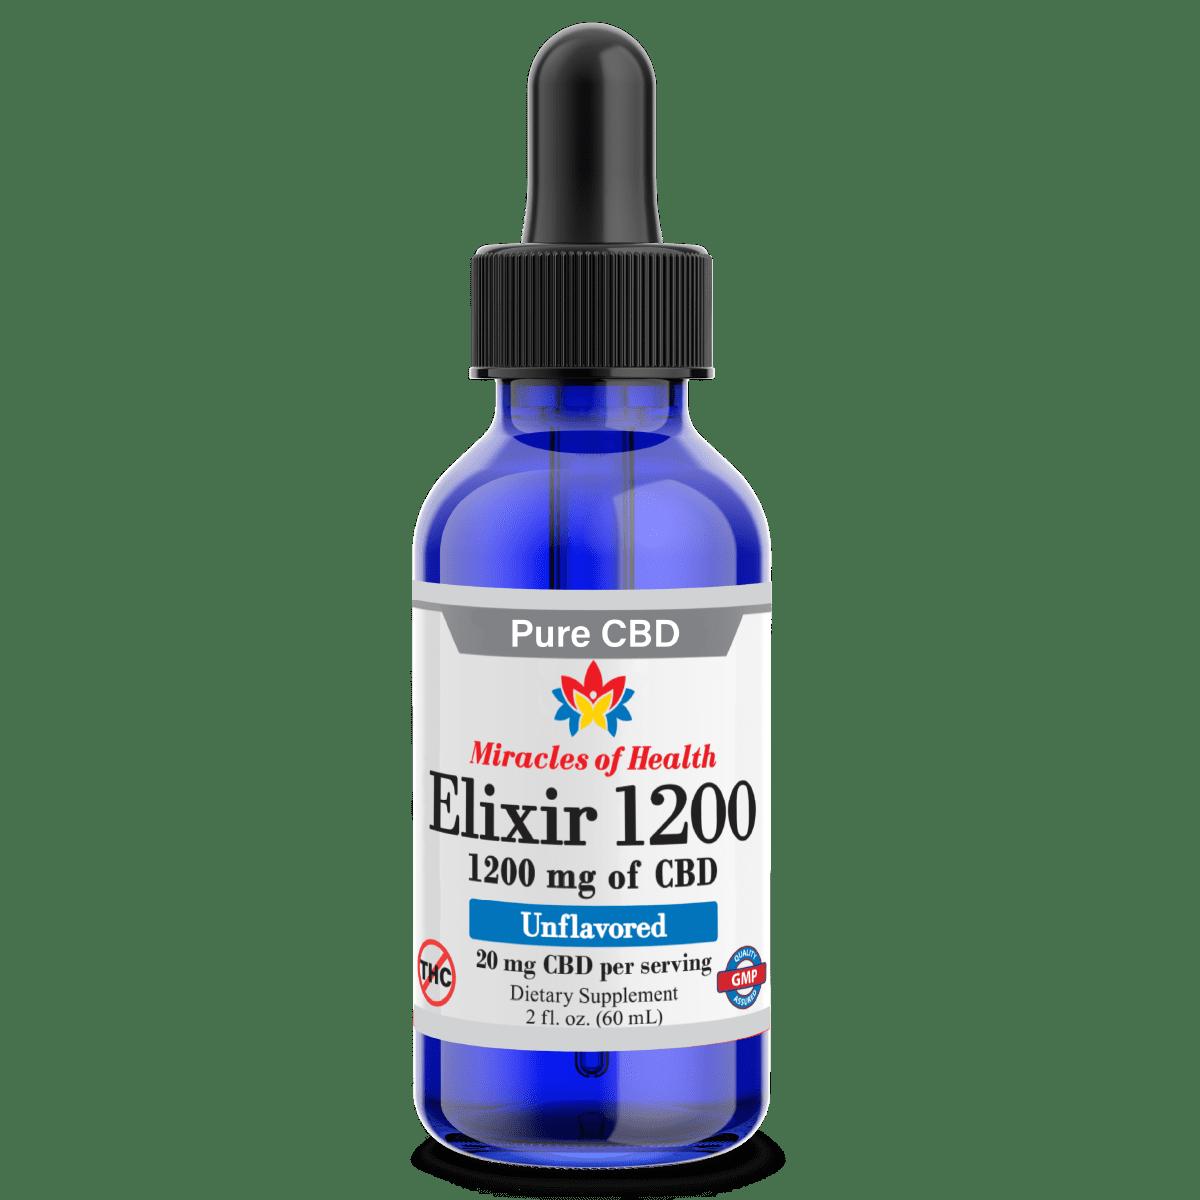 CBD Elixir, CBD, Pure CBD, cbdistillery 2500 mg, cbdistillery 500 mg, cbdistillery 2500 mg review, cbdistillery 5000 mg, cbdistillery 250 mg, cbdistillery vs medterra, cbdistillery no thc, cbdistillery number, cbdistillery nyc, cbdistillery night time gummies, cbdistillery vs nuleaf, cbdistillery contact number, cbdistillery products near me, cbdistillery telephone number, cbdistillery vs nuleaf reddit, cbdistillery colorado phone number, cbdistillery customer service number, cbdistillery vs lazarus naturals, cbdistillery oil, cbdistillery order, cbdistillery oil reviews, cbdistillery order status, cbdistillery oil dosage, cbdistillery order tracking, cbdistillery on amazon, cbdistillery oil 33mg, cbdistillery organic, cbdistillery oil reddit, cbdistillery official website, cbdistillery oil uk, cbdistillery owner, cbdistillery or lazarus, cbdistillery on, cbdistillery vape oil, cbdistillery products, cbdistillery promo, cbdistillery pet, cbdistillery pet tincture, cbdistillery pen, cbdistillery pesticides, cbdistillery pm gummies, cbdistillery patches, cbdistillery phone, cbdistillery paypal, cbdistillery pills, cbdistillery parent company, cbdistillery purity, cbdistillery pet review, cbdistillery promo code reddit, cbdistillery packaging, cbdistillery promo code 15, cbdistillery quality, cbdistillery para que sirve, cbdistillery retailers, cbdistillery rx, cbdistillery rewards, cbdistillery ratings, cbdistillery returns, cbdistillery revenue, cbdistillery rechargeable vape pen, cbdistillery referral, cbdistillery reddit, cbdistillery reviews 2019, cbdistillery reddit review, cbdistillery reddit code, cbdistillery retailmenot, cbdistillery reddit 2019, cbdistillery stock, cbdistillery softgels, cbdistillery salve, cbdistillery shipping, cbdistillery strawberry lemonade, cbdistillery sale, cbdistillery salve review, cbdistillery sleep, cbdistillery shatter, cbdistillery sign in, cbdistillery stores, cbdistillery slab, cbdistillery strawberry lemonade cartridge, cbdi